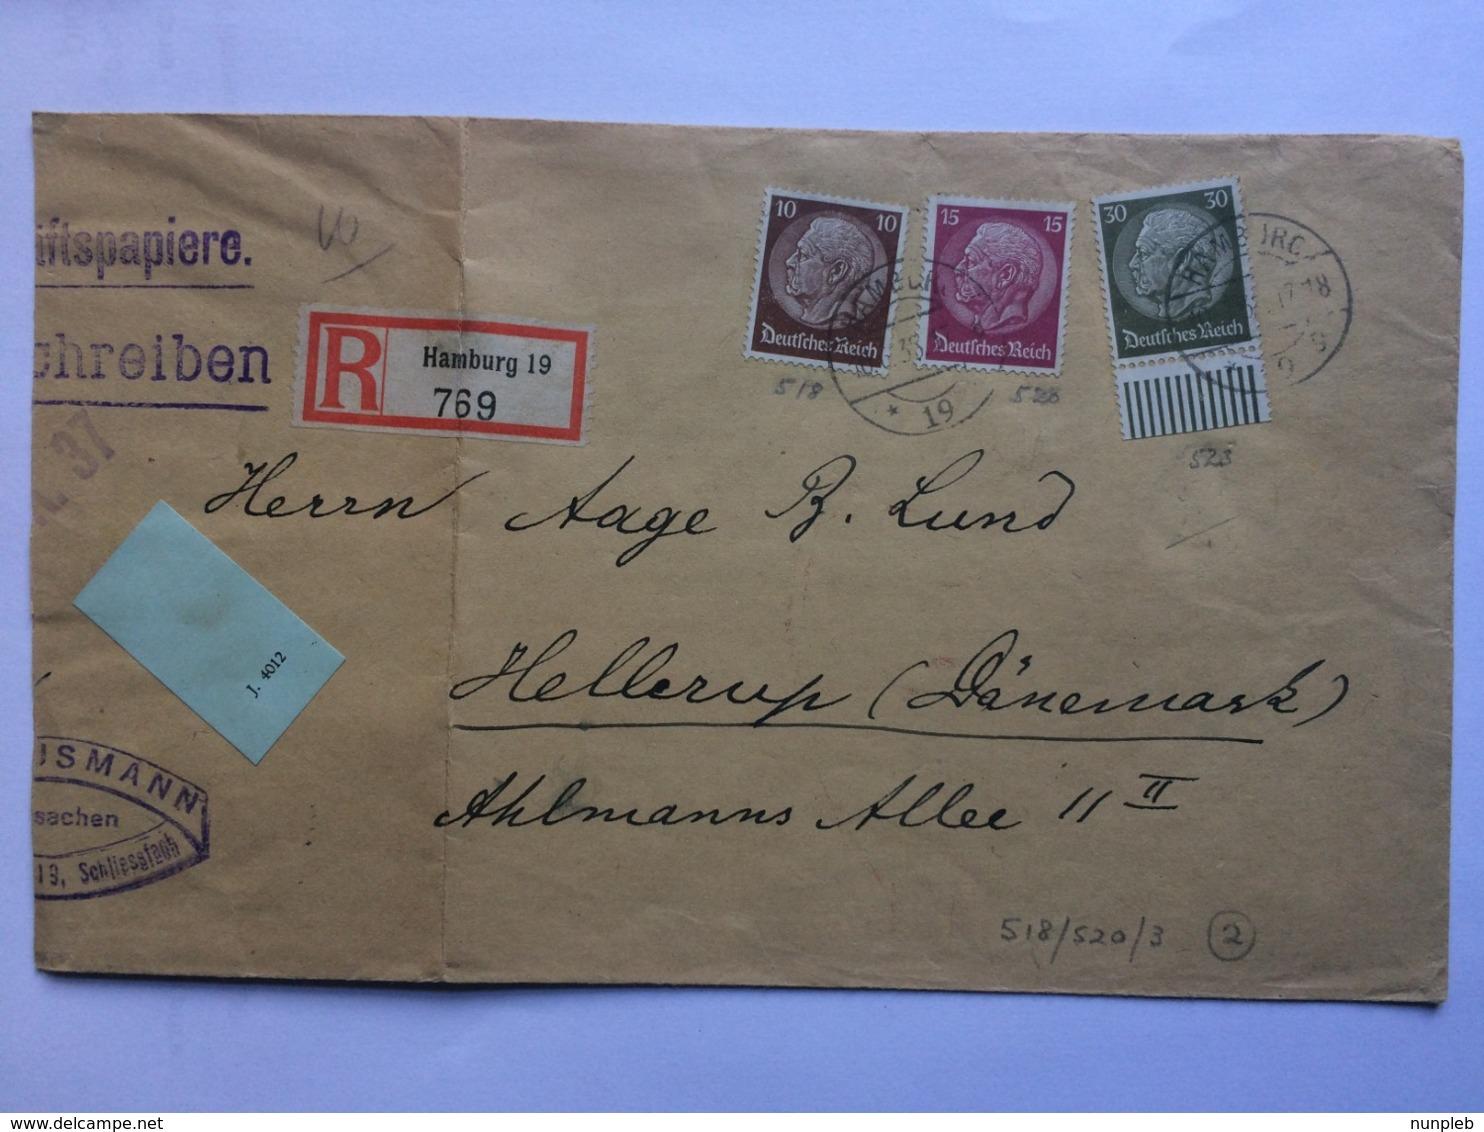 GERMANY 1938 Registered Hamburg Cover To Hellerup Denmark - Deutschland